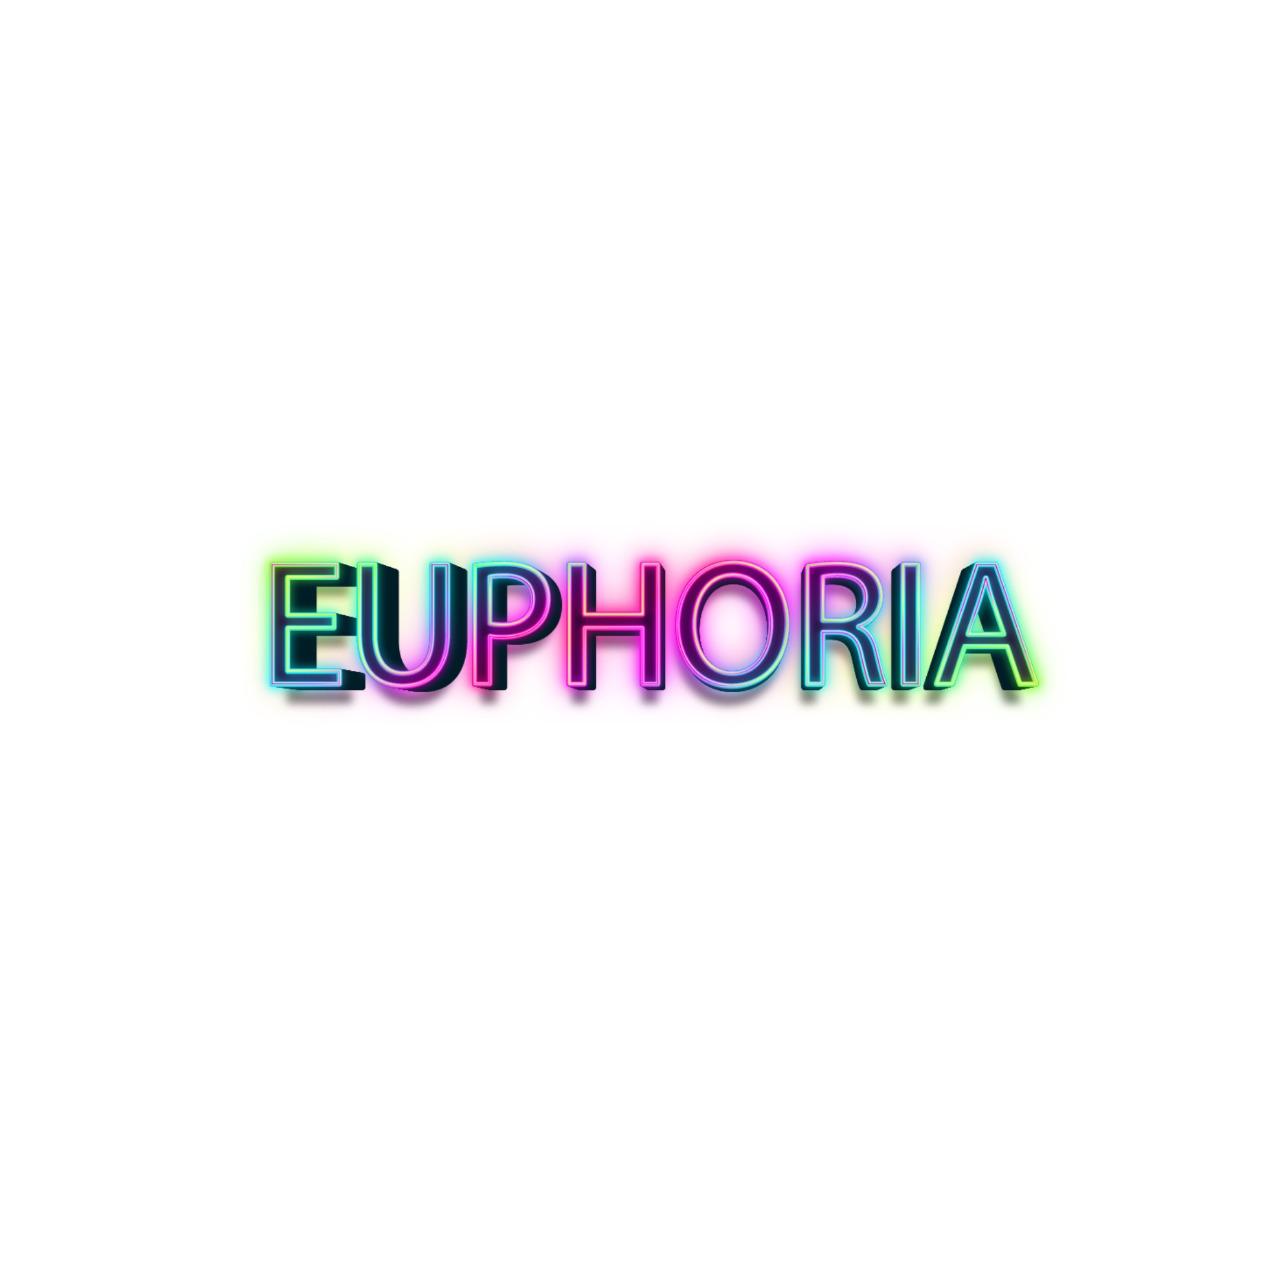 @hola_euphoria